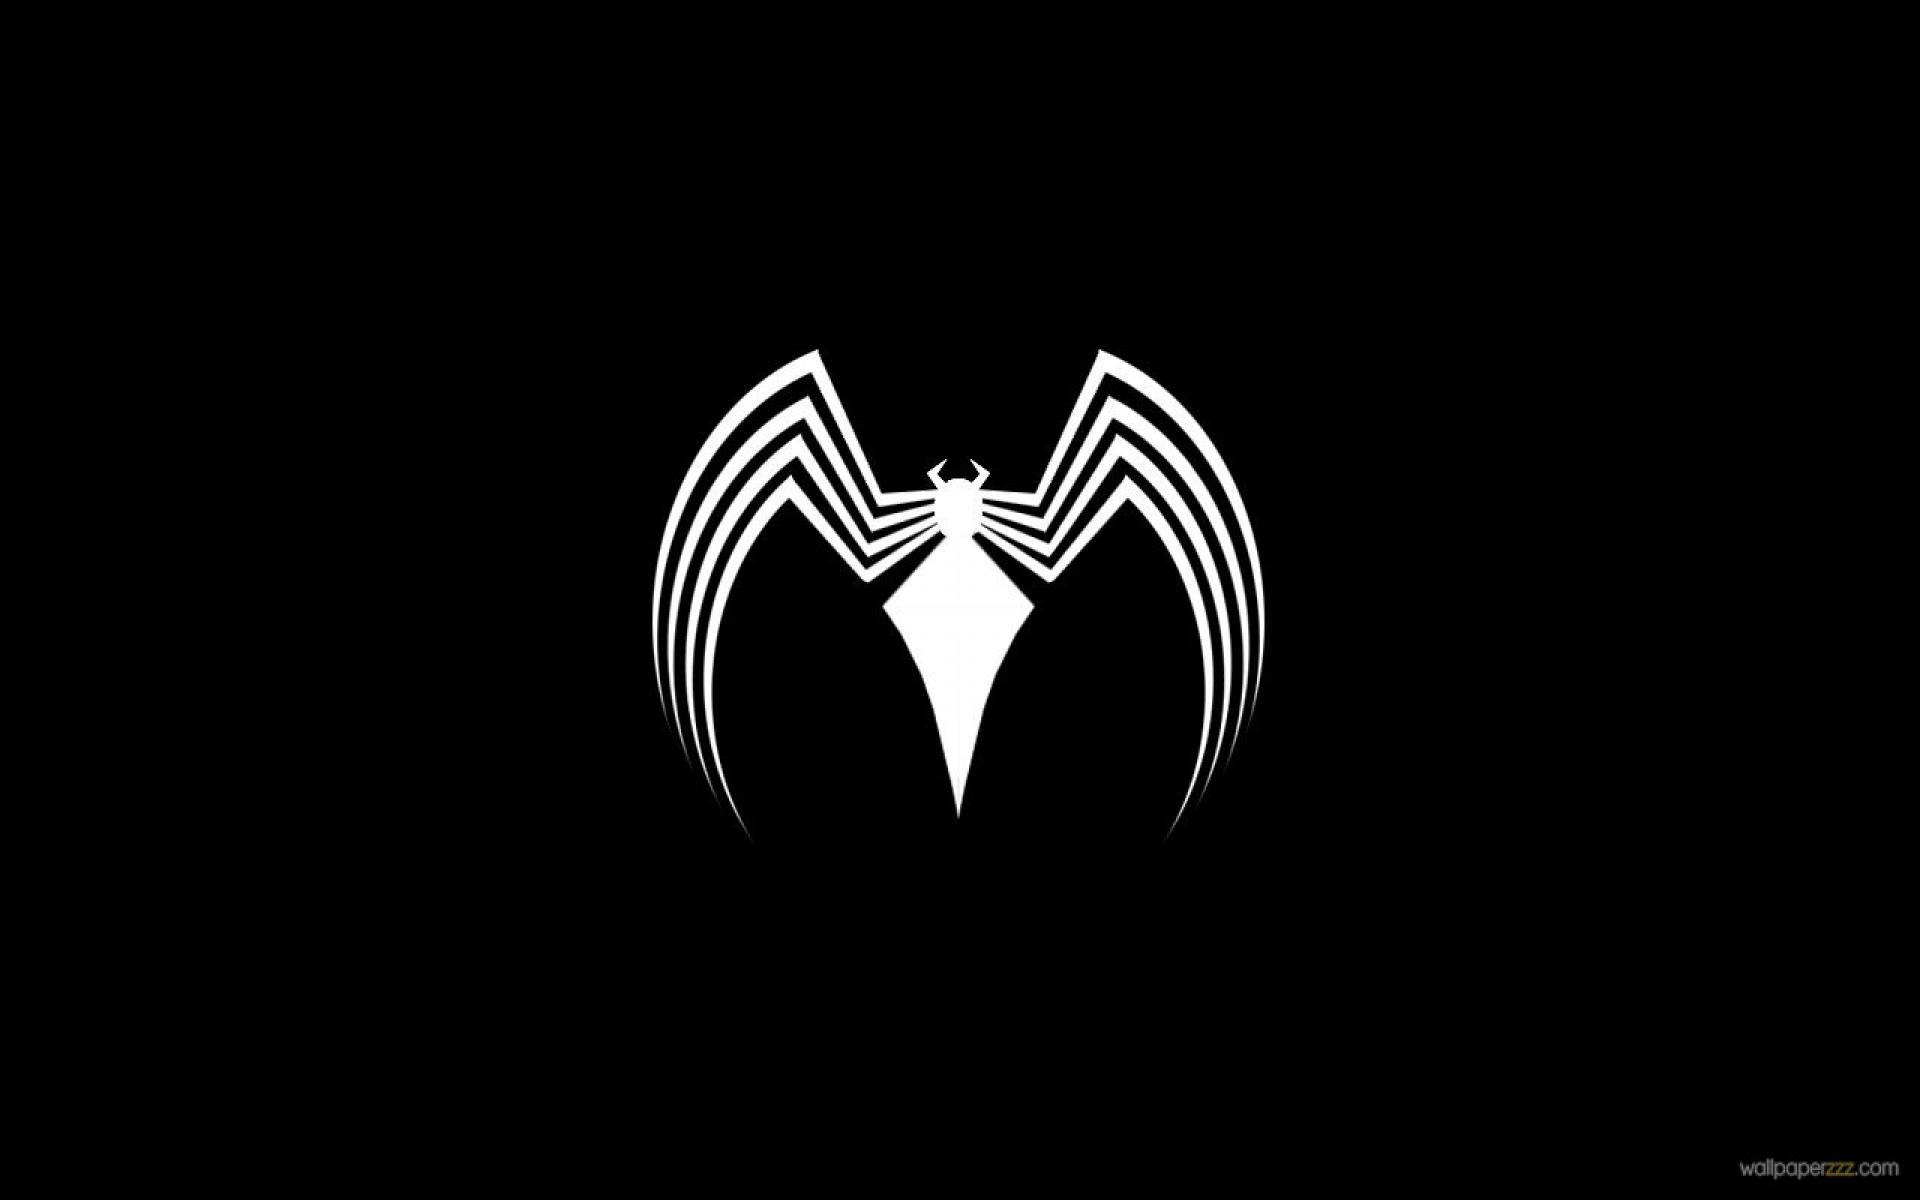 suite spiderman widescreen wallpaper wallpaper 1920x jpg 292458 1920x1200